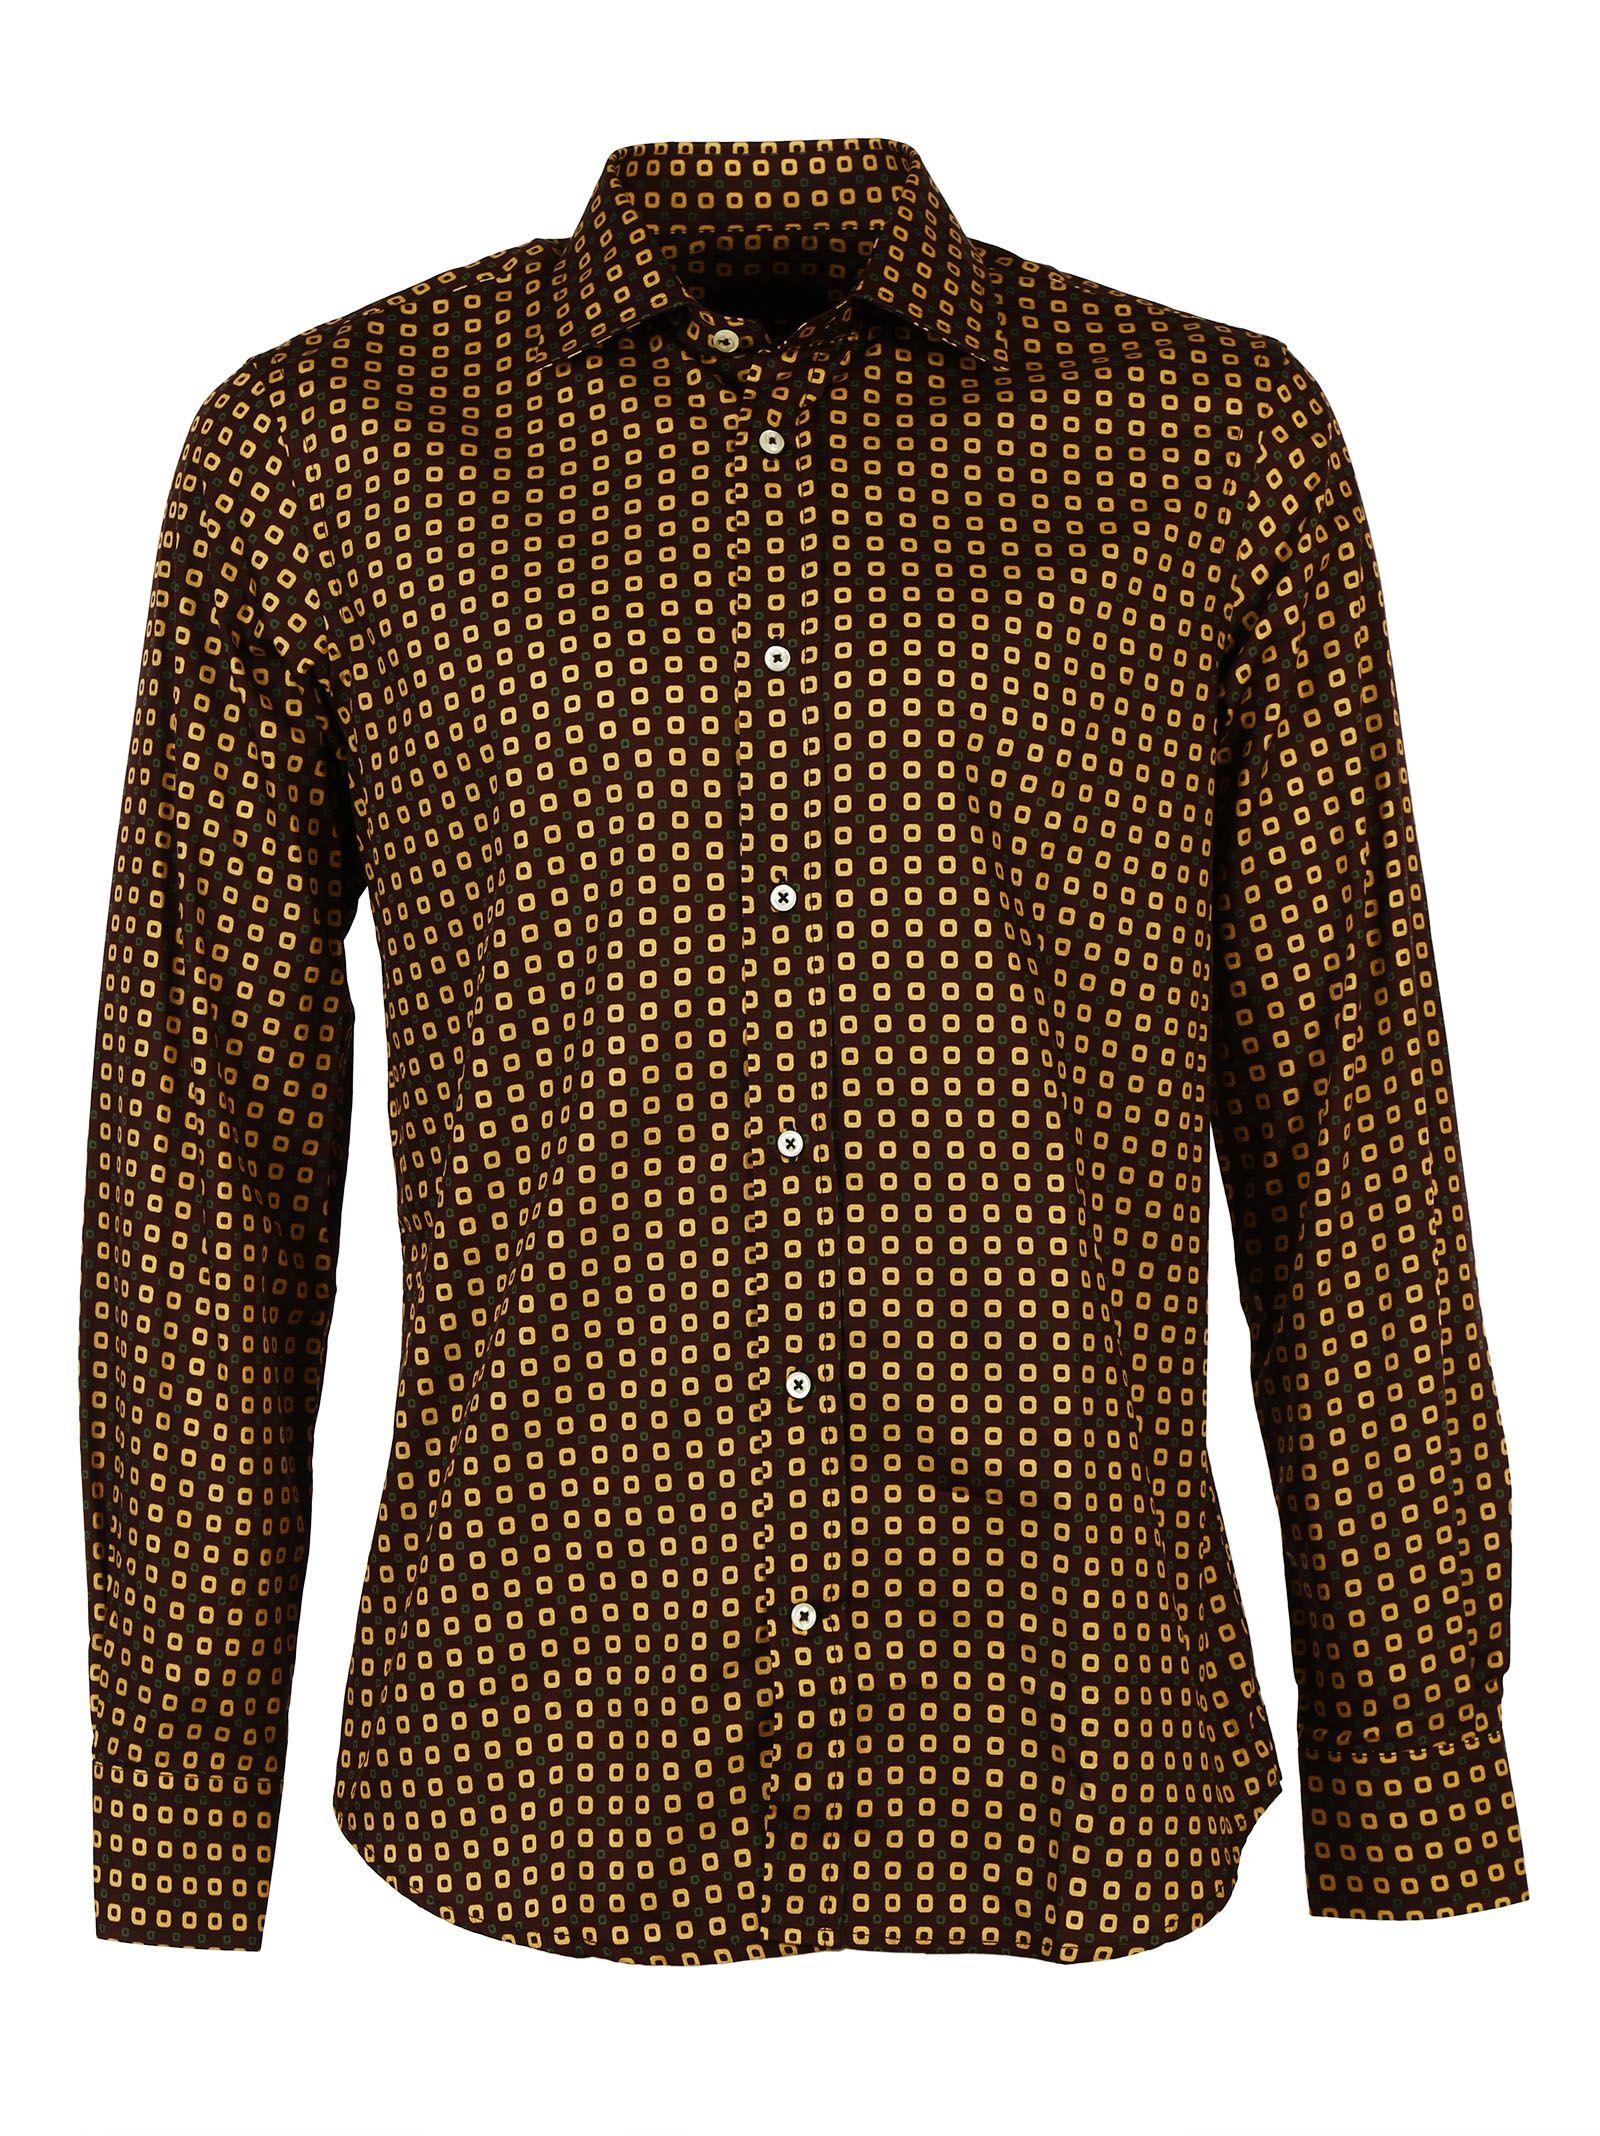 Luchino Camicie Cotton Slimfit Shirt